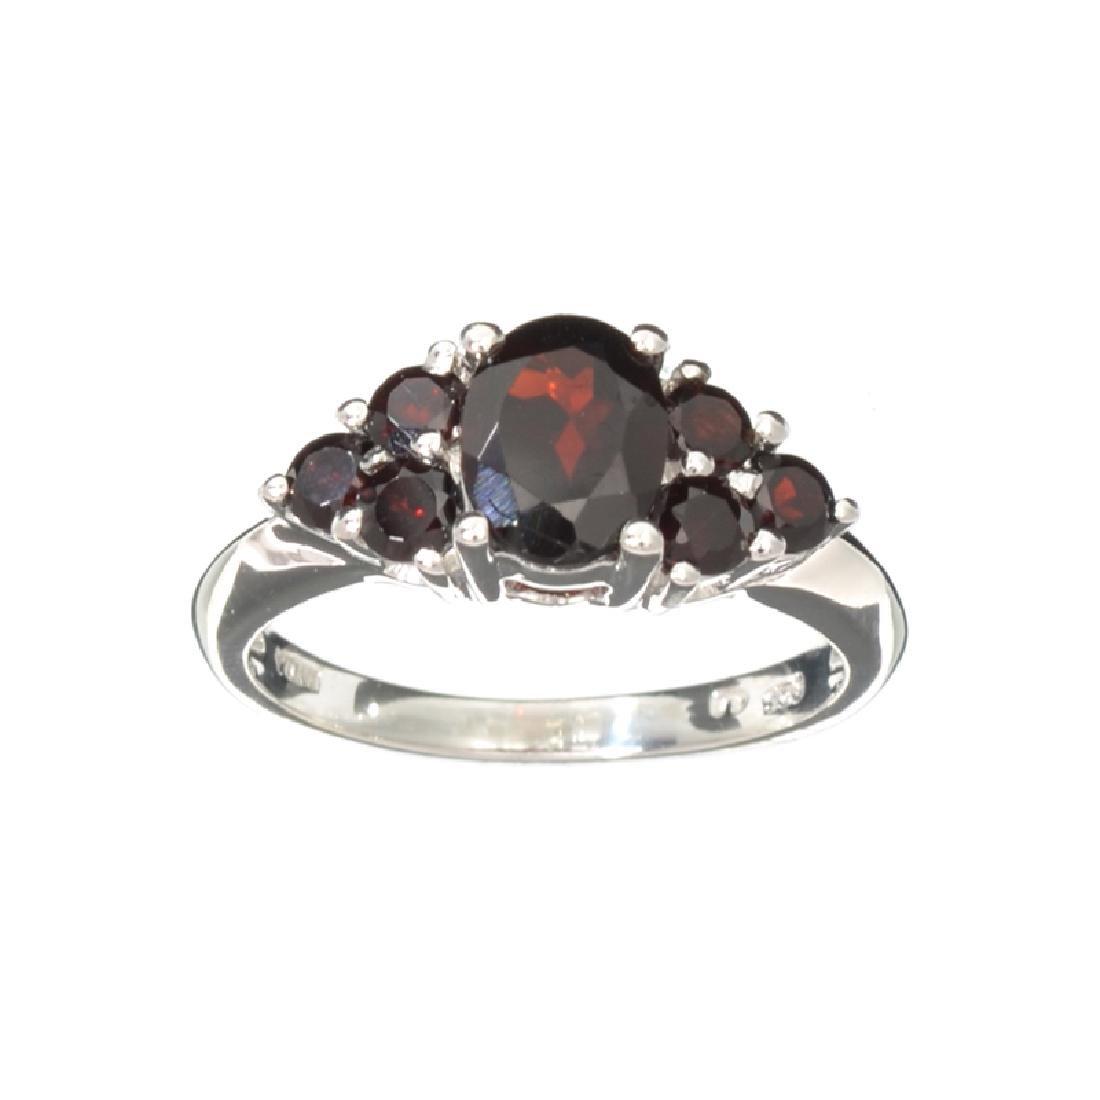 APP: 0.3k Fine Jewelry 2.40CT Almandite Garnet And